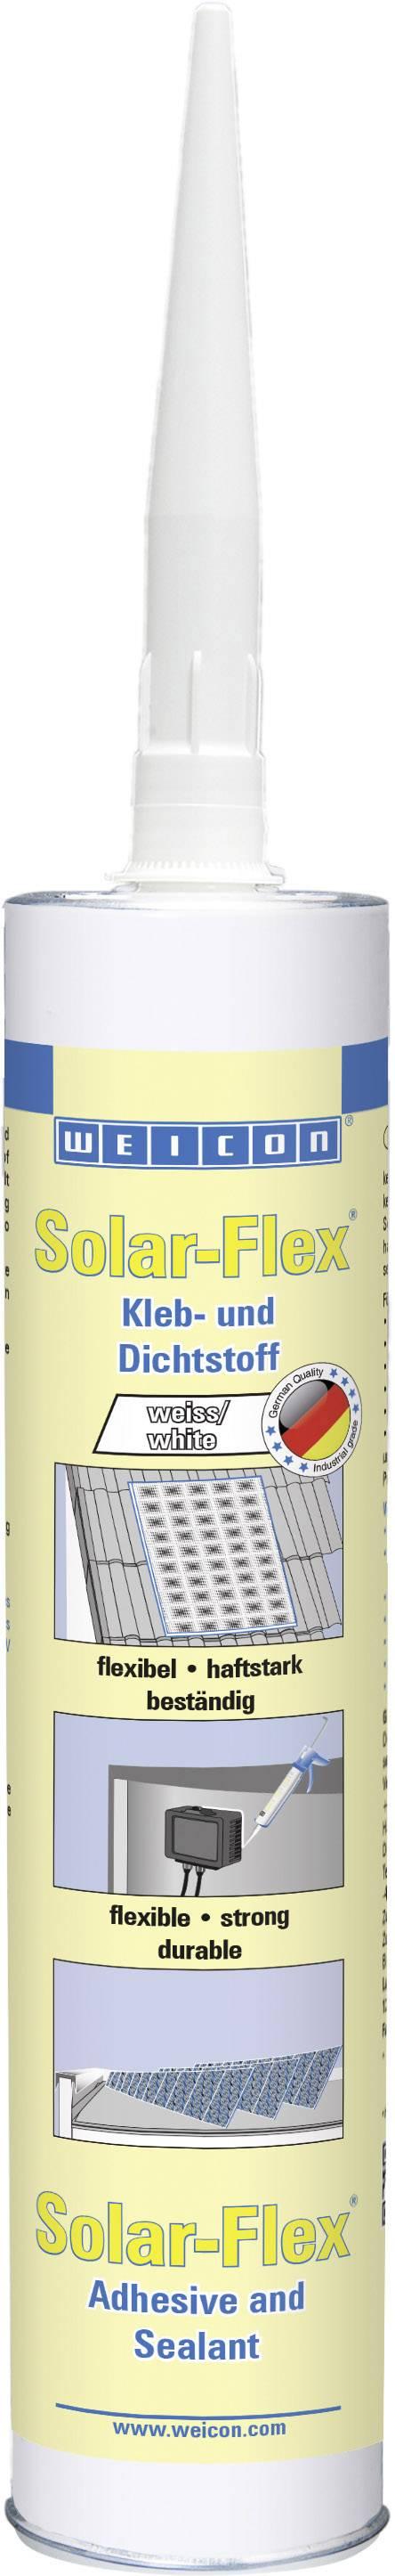 WEICON Solar-Flex Adhesive sealant Colour White 13750290 290